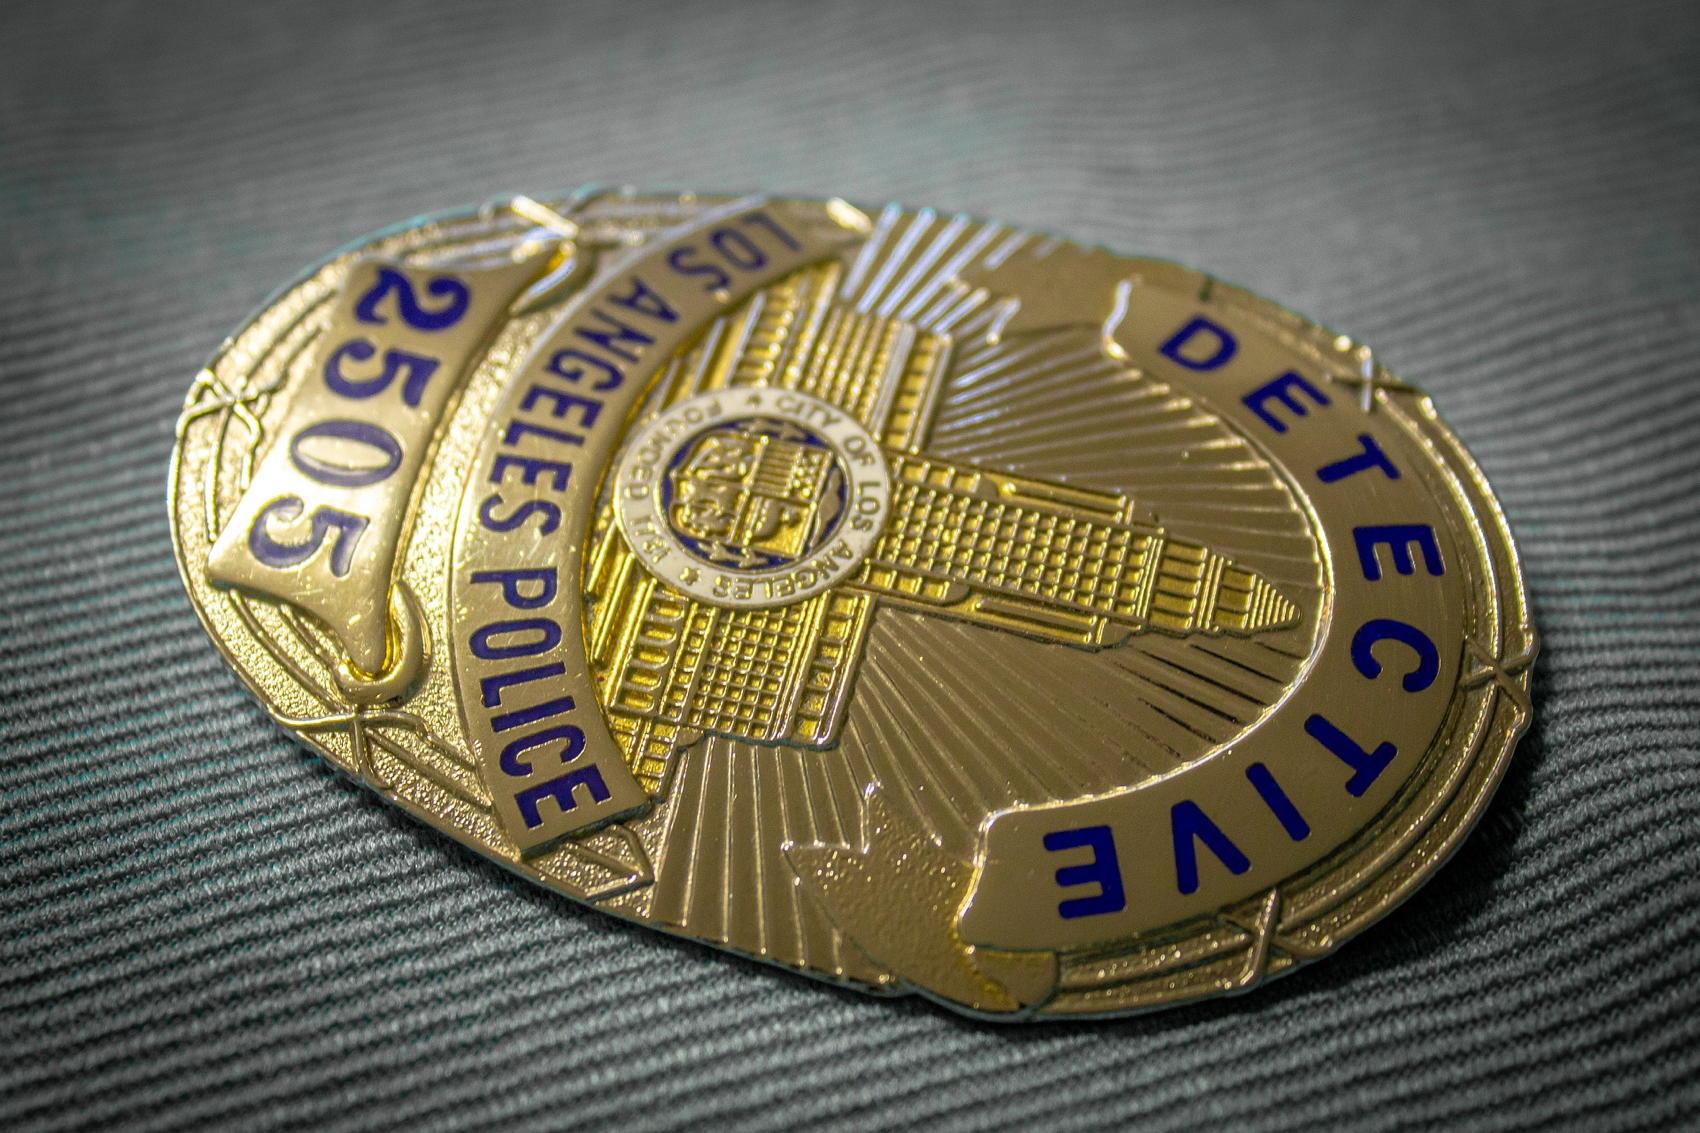 LAPD Detective Badge - Image by Vladan Rajkovic